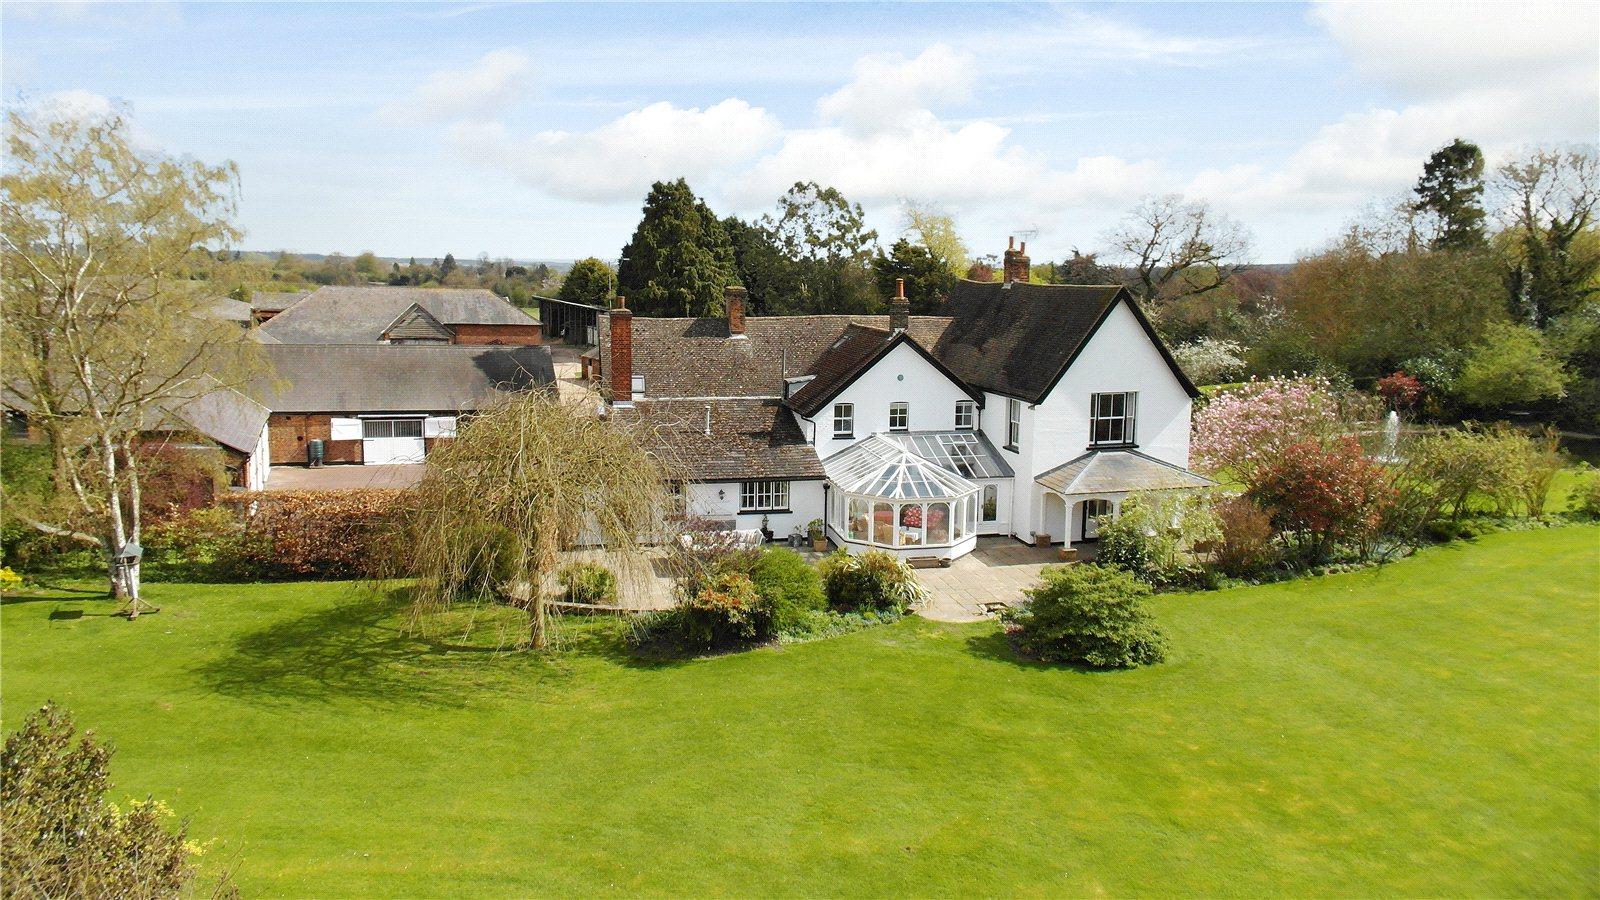 Tek Ailelik Ev için Satış at Park Lane, Old Knebworth, Knebworth, Hertfordshire, SG3 Knebworth, Ingiltere